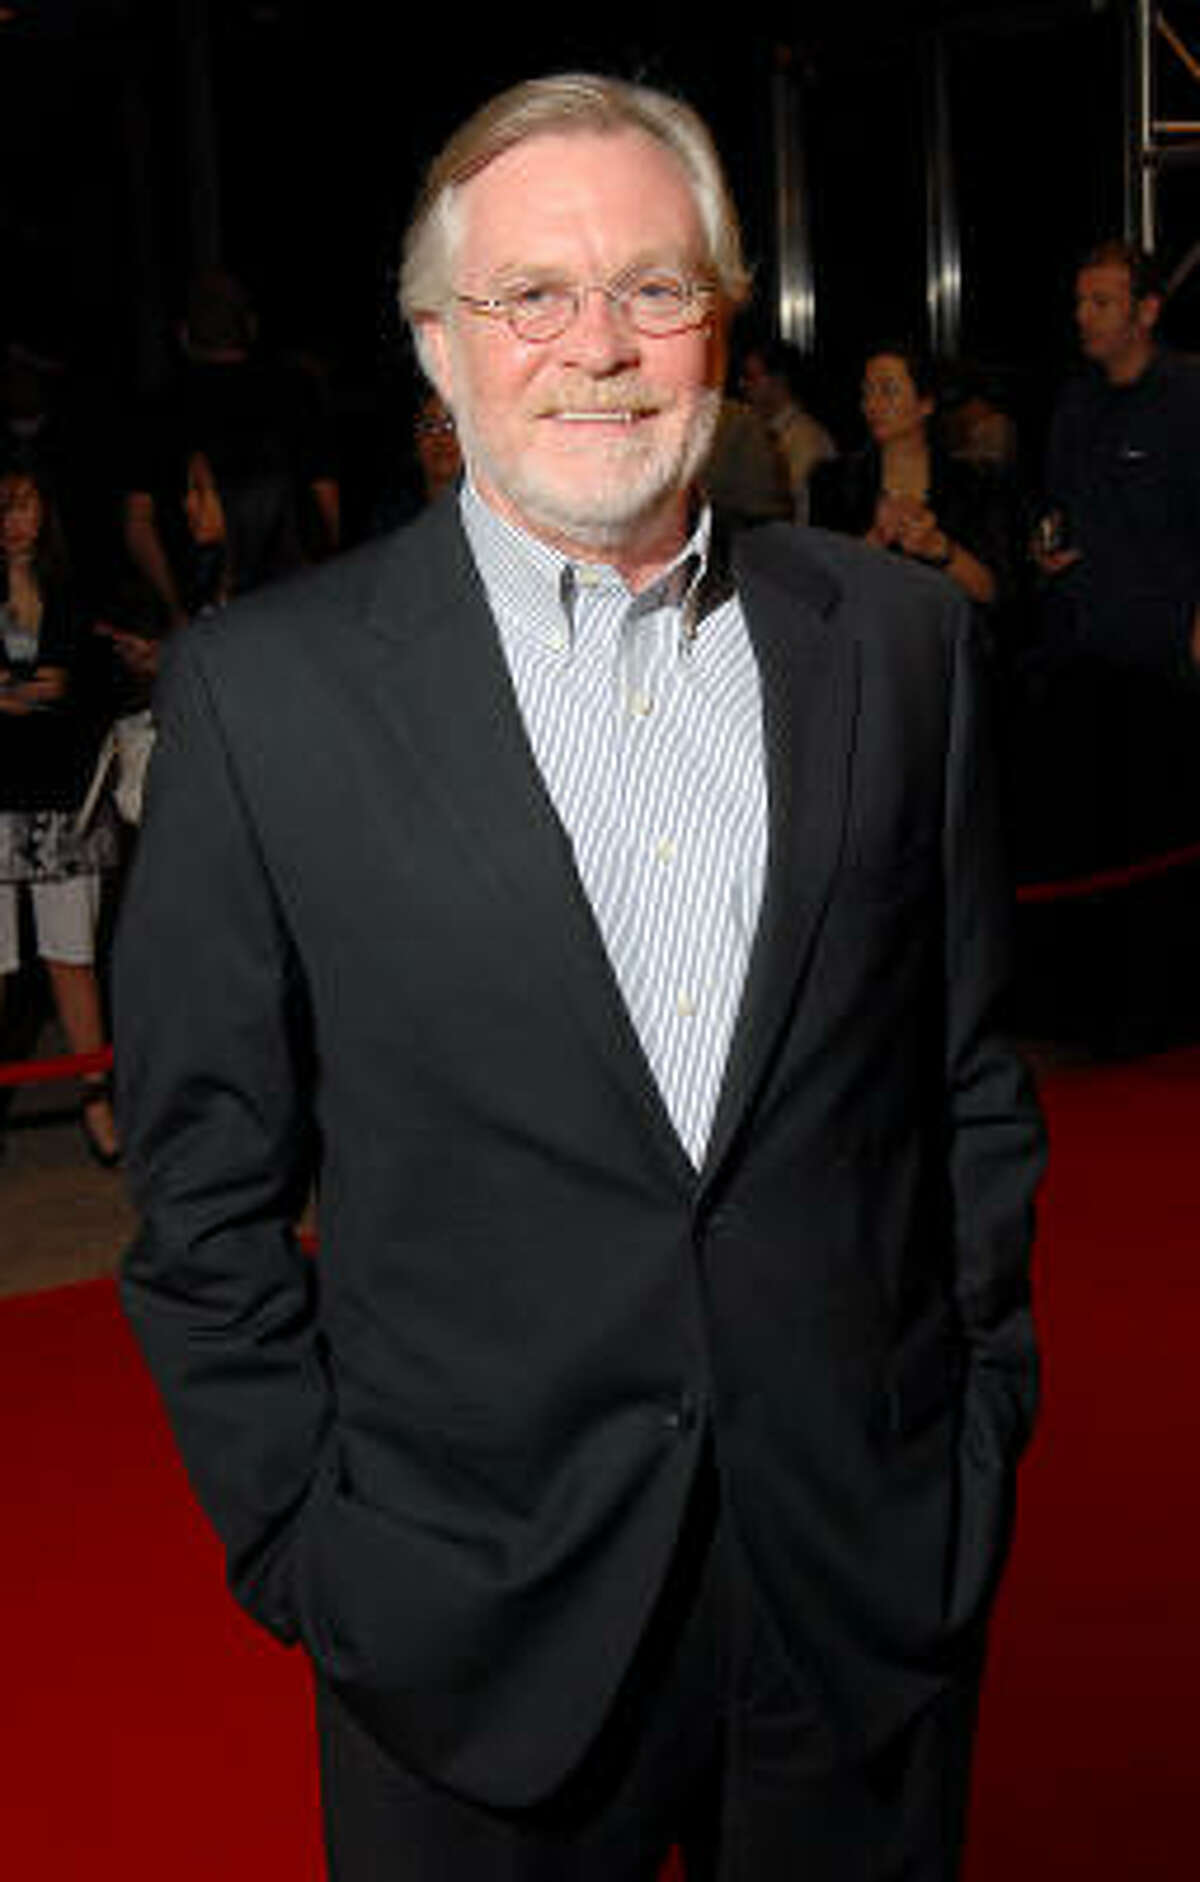 Rick Ferguson, executive director of the Houston Film Commission